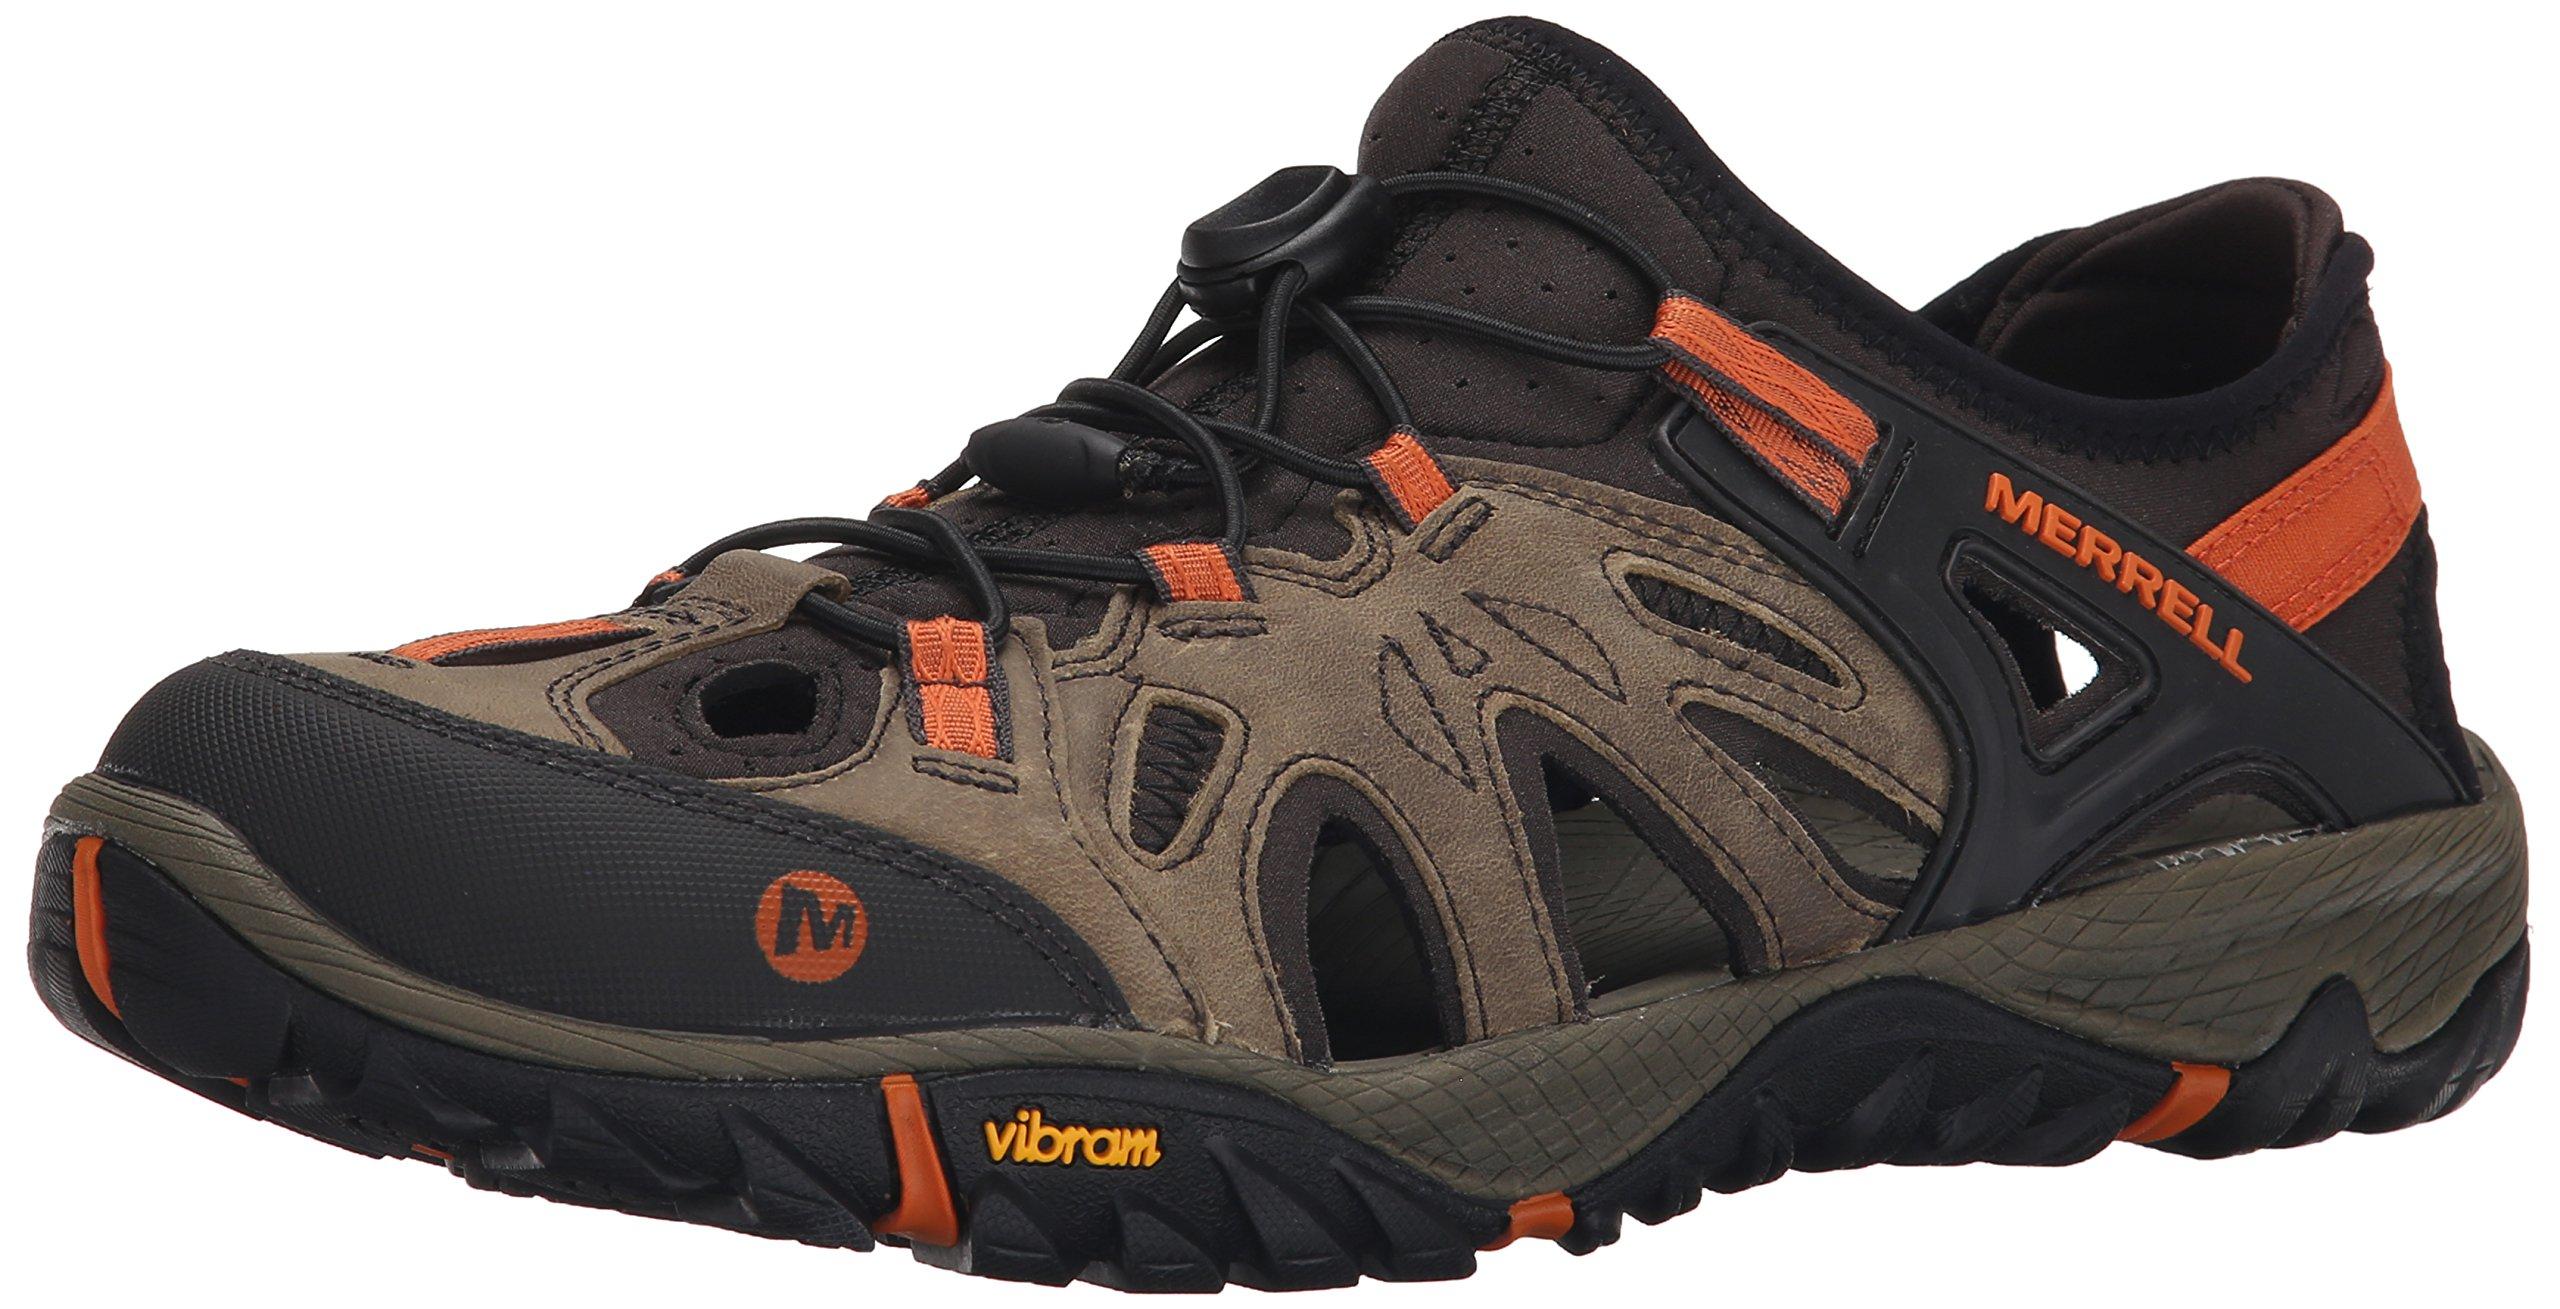 Merrell Men's All Out Blaze Sieve Water Shoe, Light Brown, 14 M US